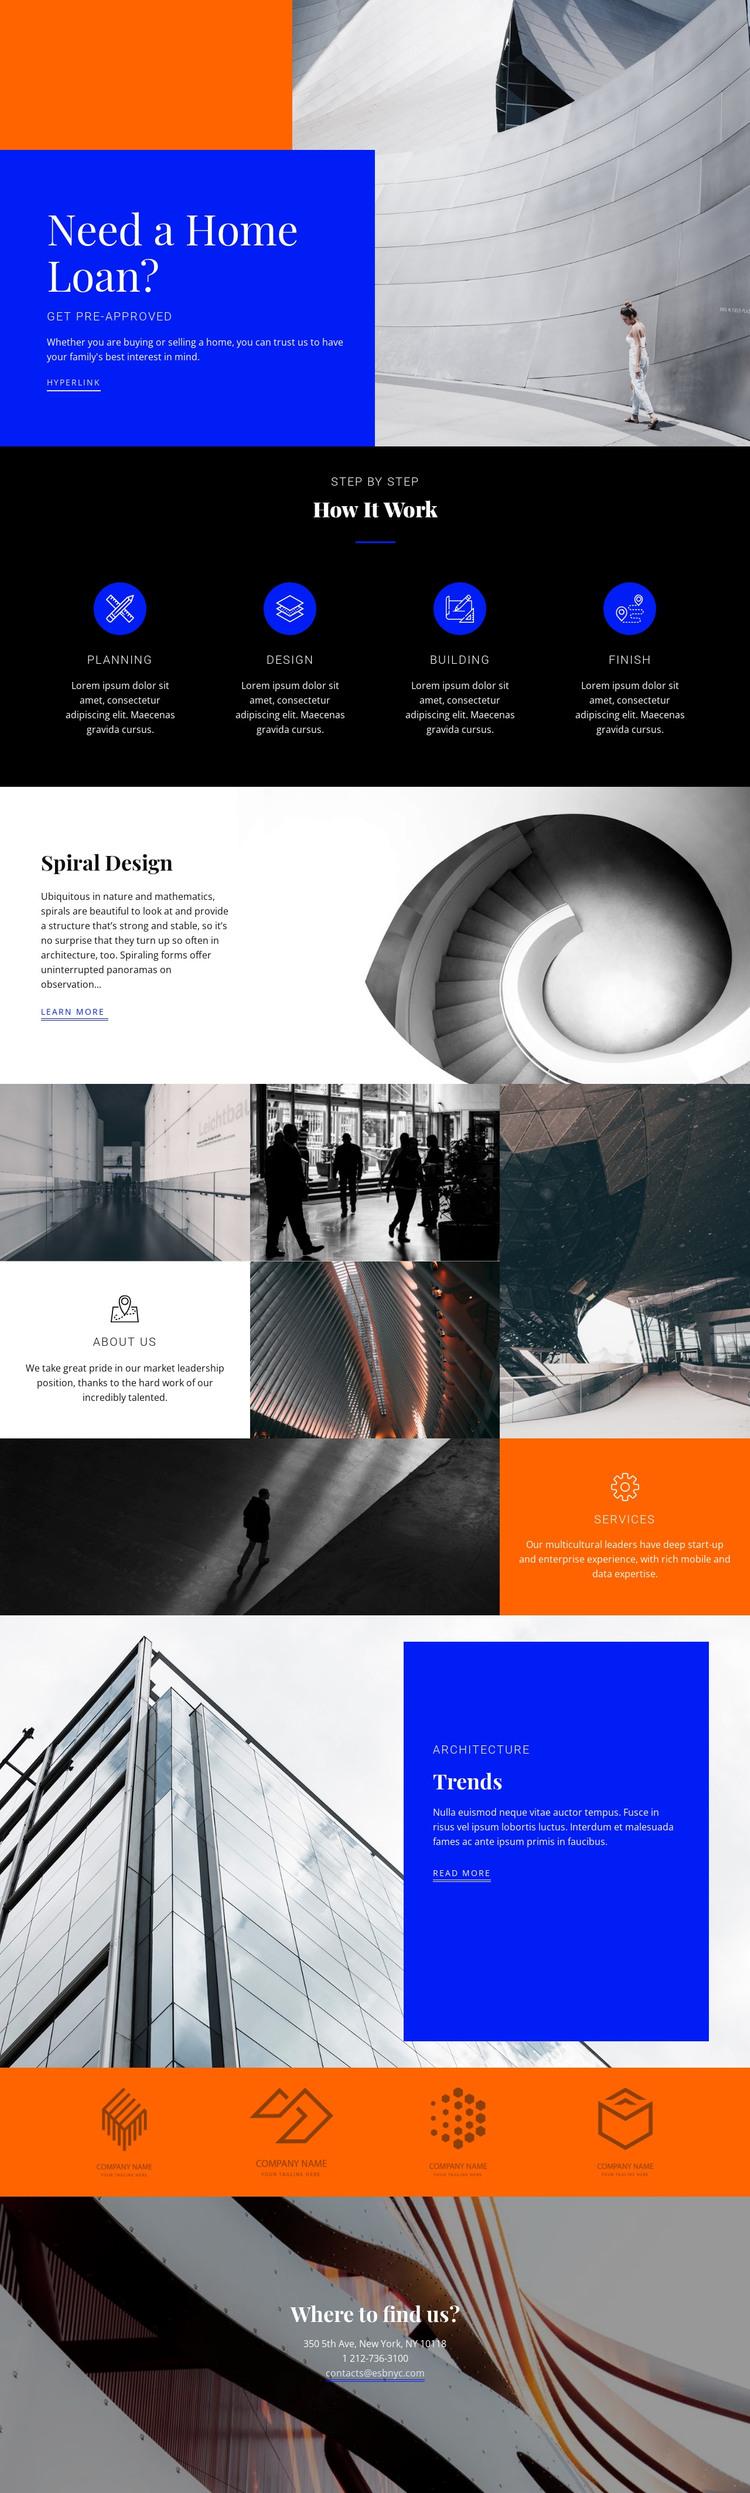 Local real estate agency Web Design